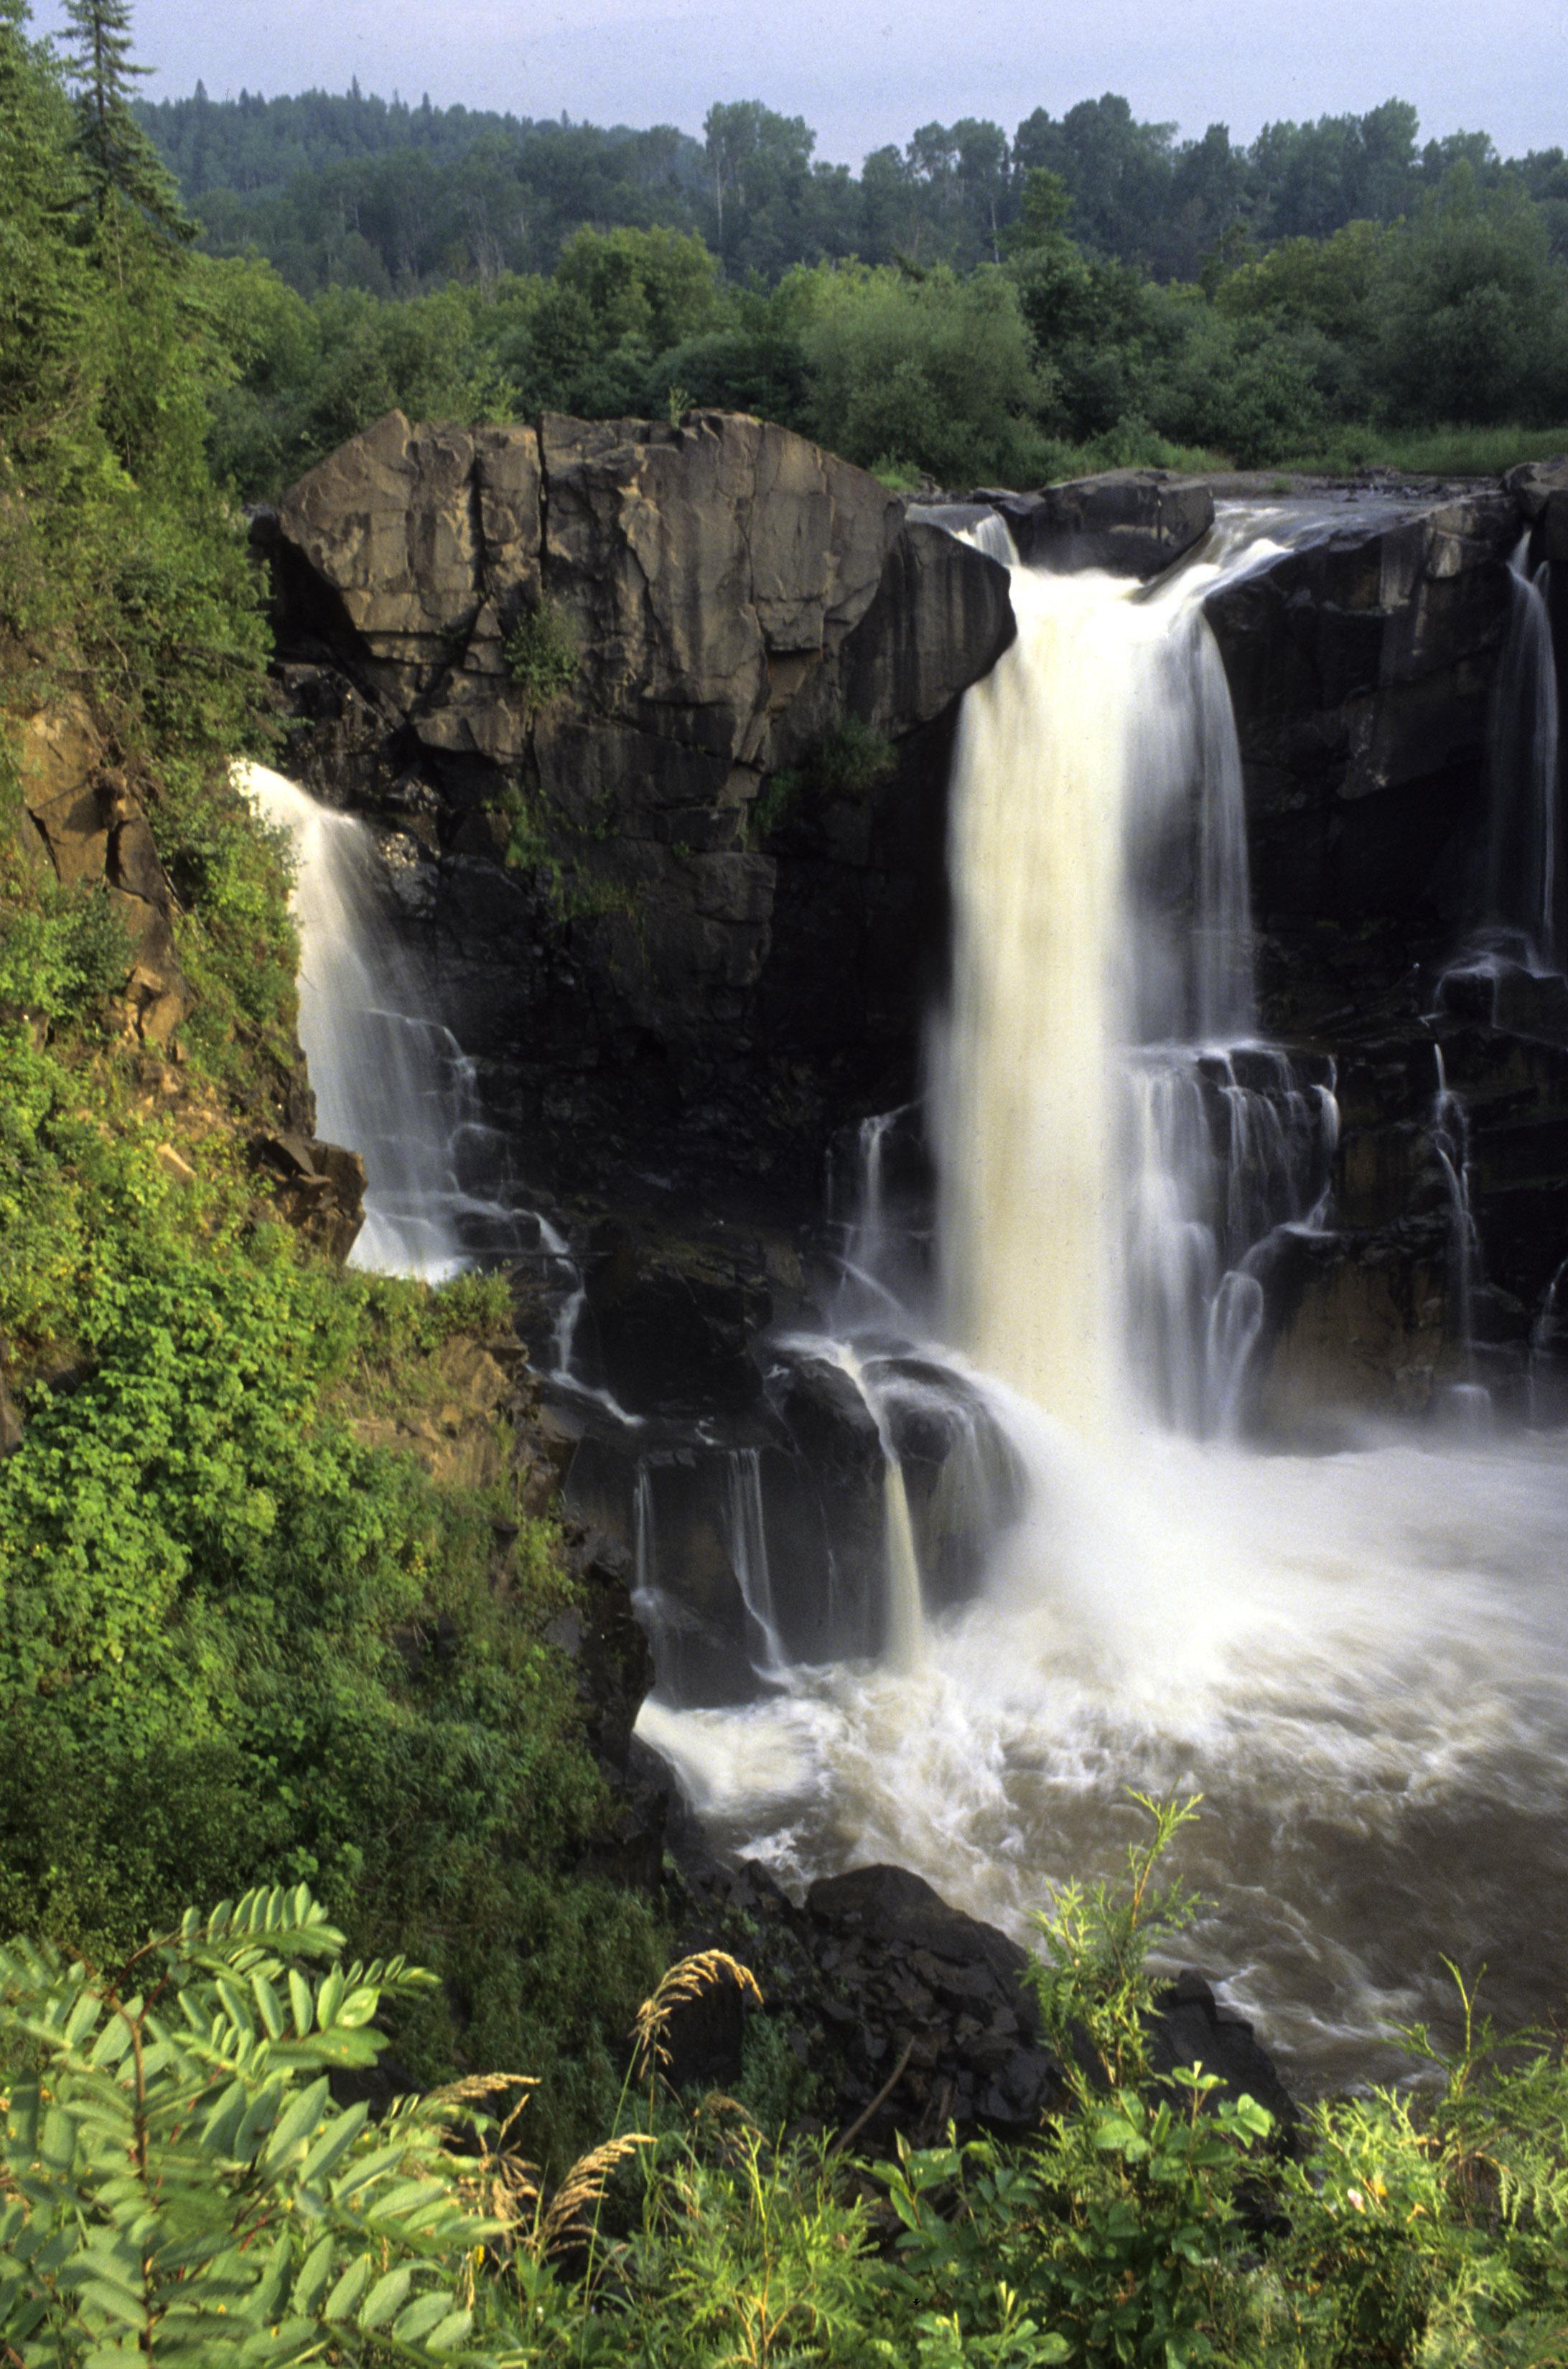 Photo Courtesy of Explore Minnesota Tourism